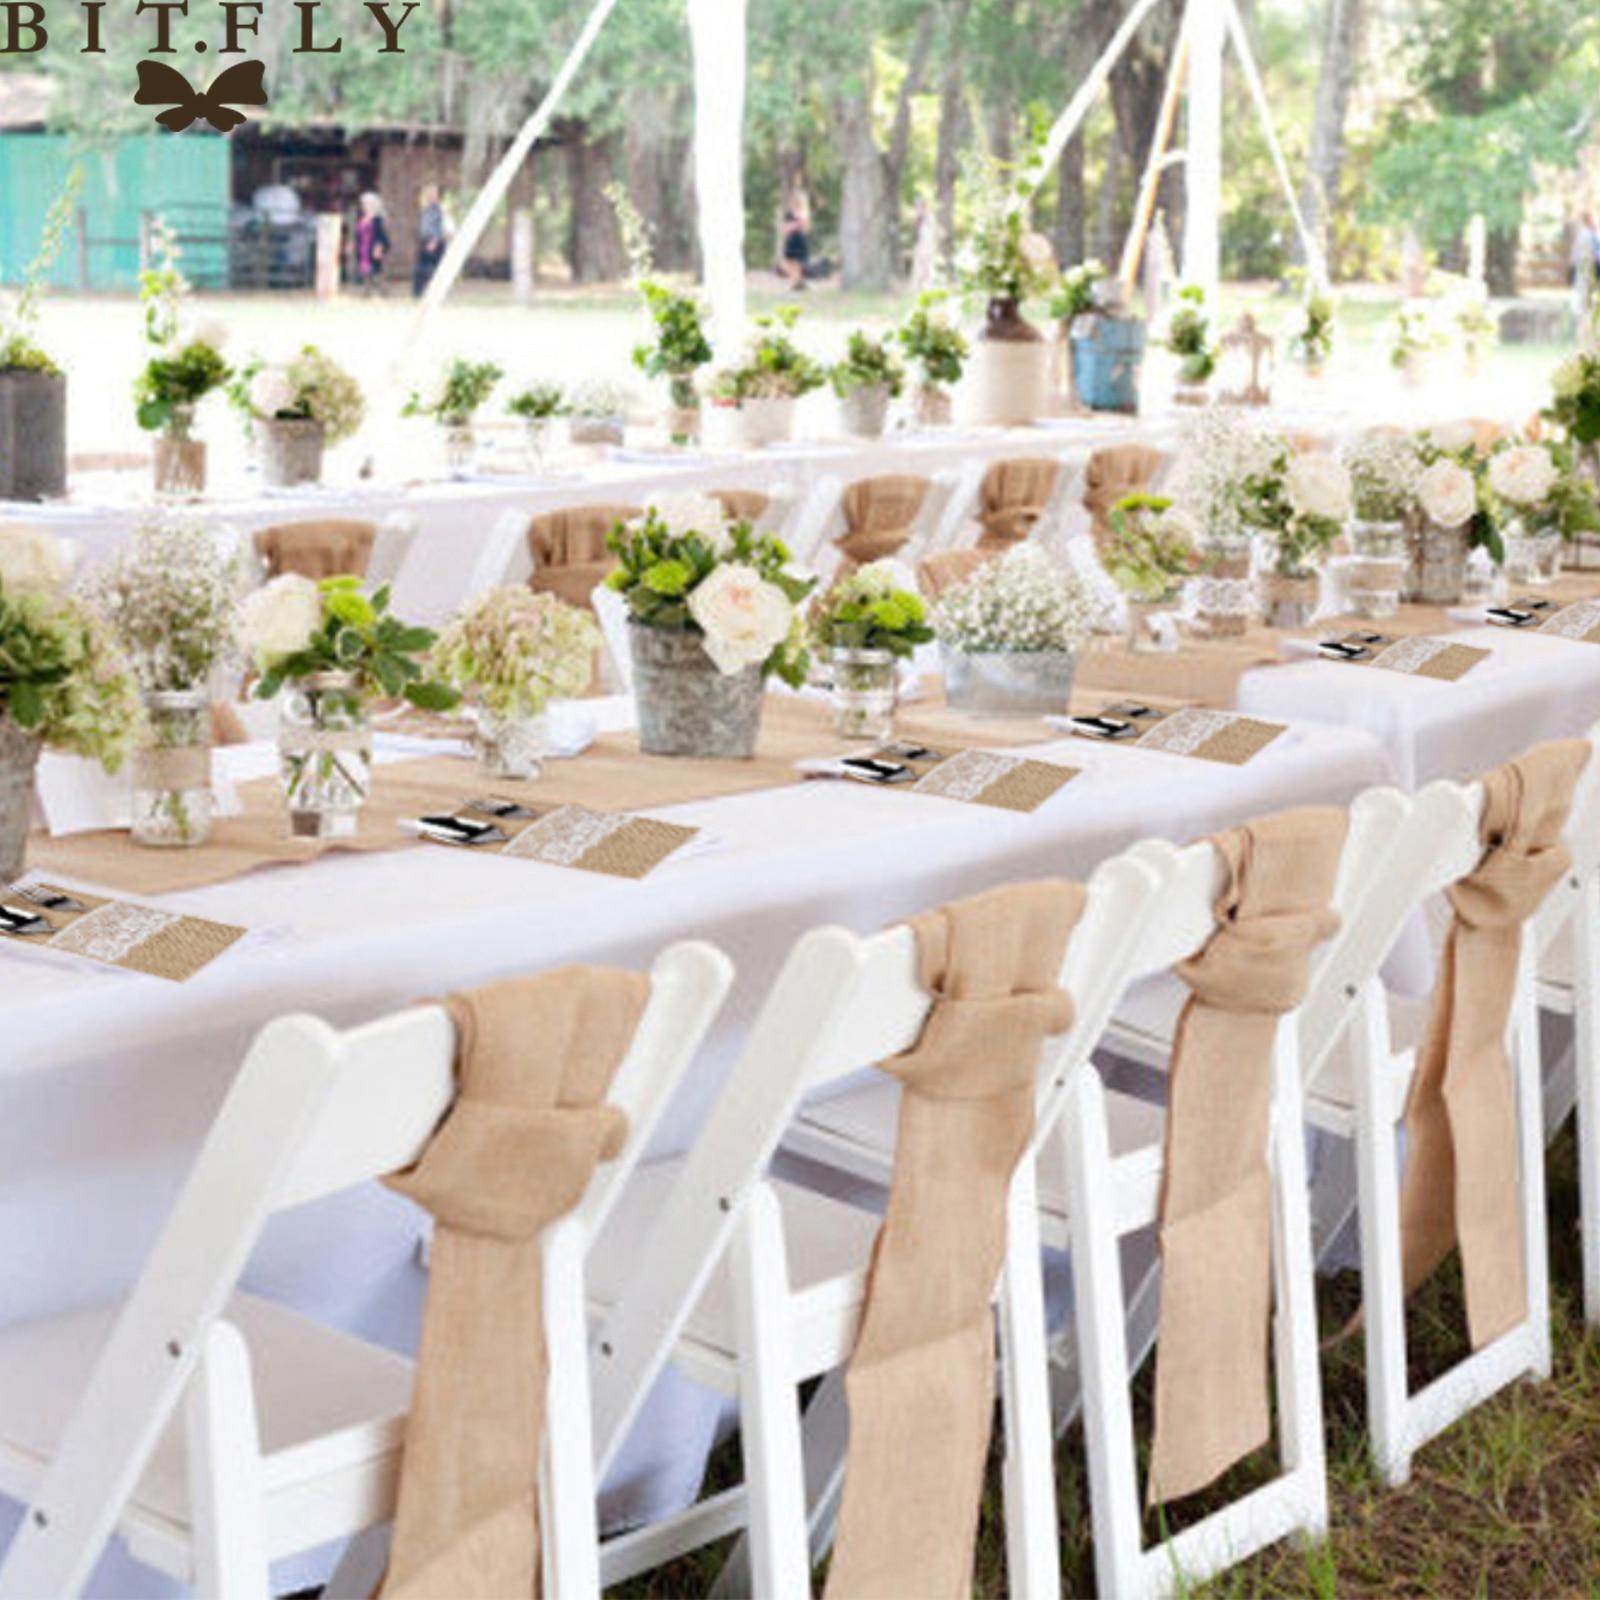 beach wedding chair decoration ideas handicap shower rustic burlap sashes jute tie bow